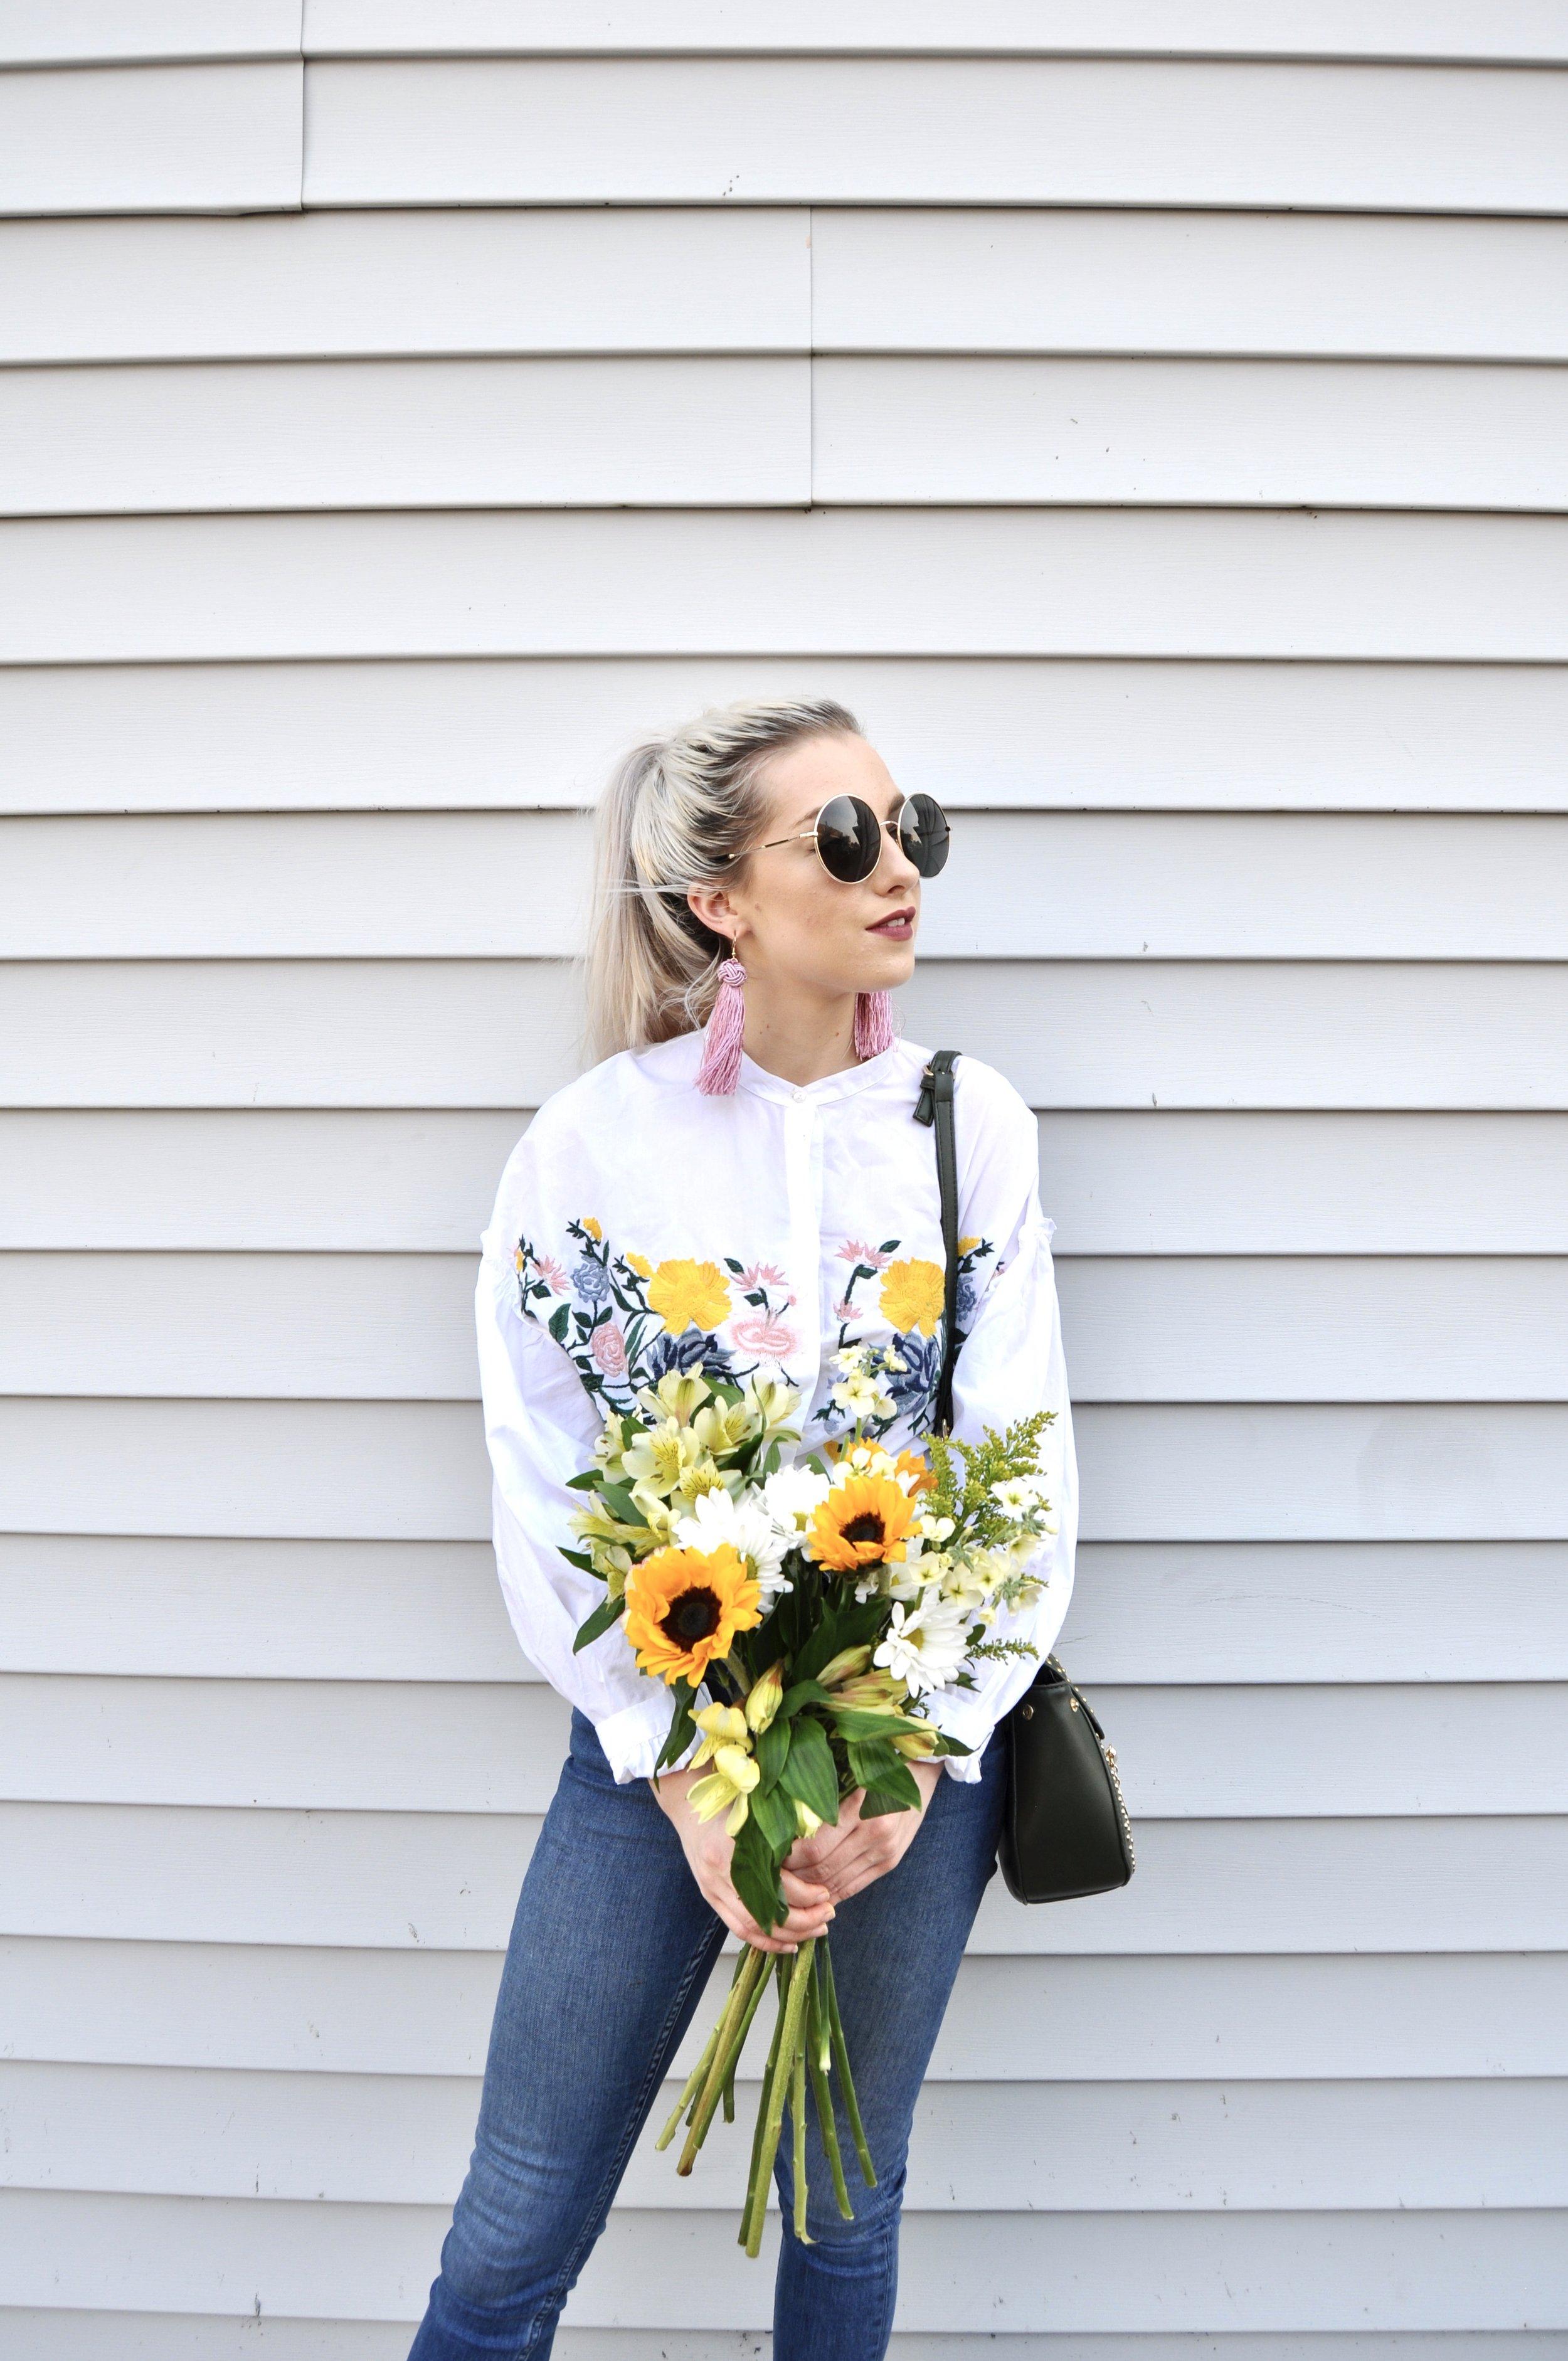 Sunglasses: Forever21, Shirt: Zara, Jeans: Topshop, Shoes: Zara, Bag: Monroe Boutique, Earrings: Style Encore Conway